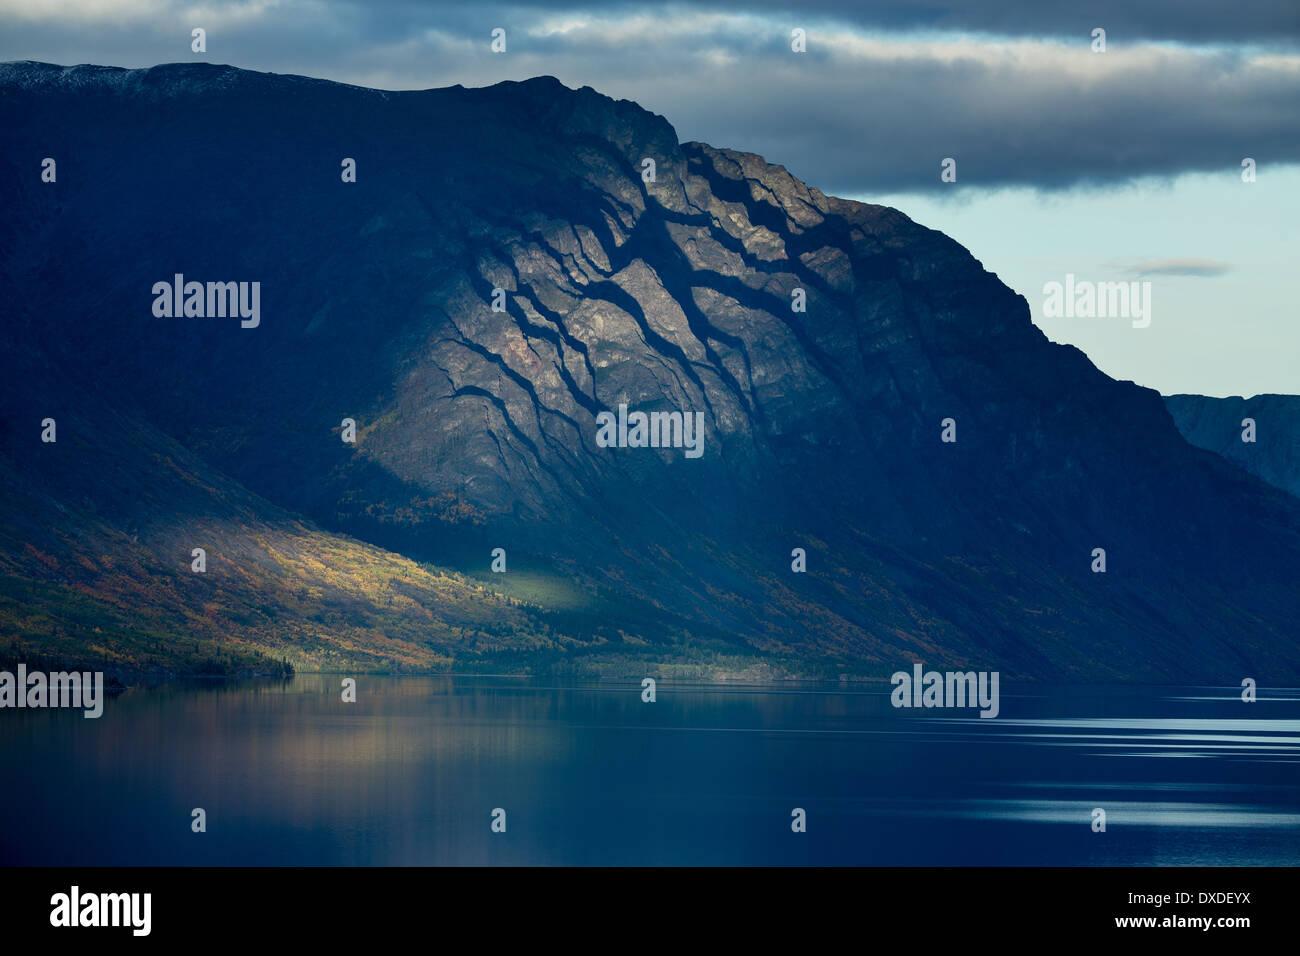 El Lago Tagish, Carcross, British Columbia, Canadá Imagen De Stock